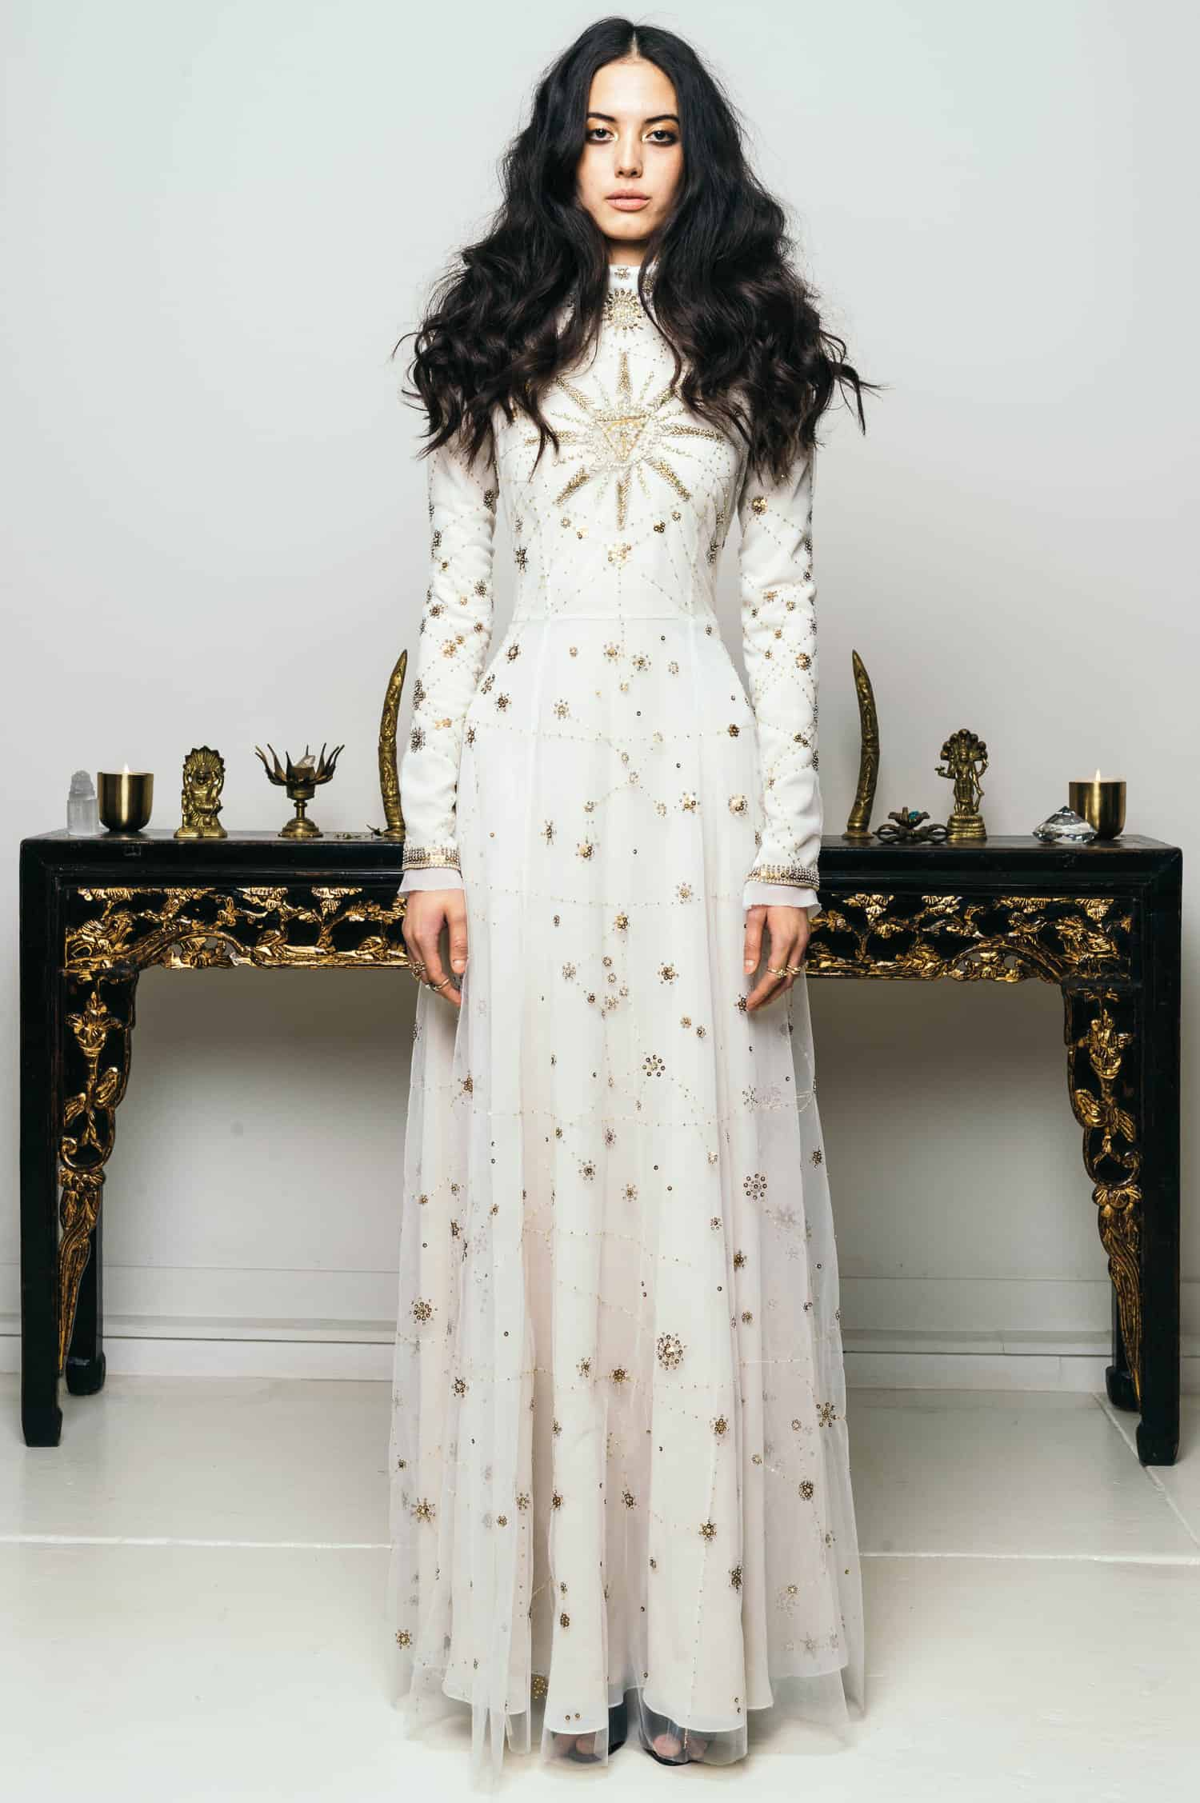 cucculelli-shaheen-constellation-galaxy-themed-wedding-dress